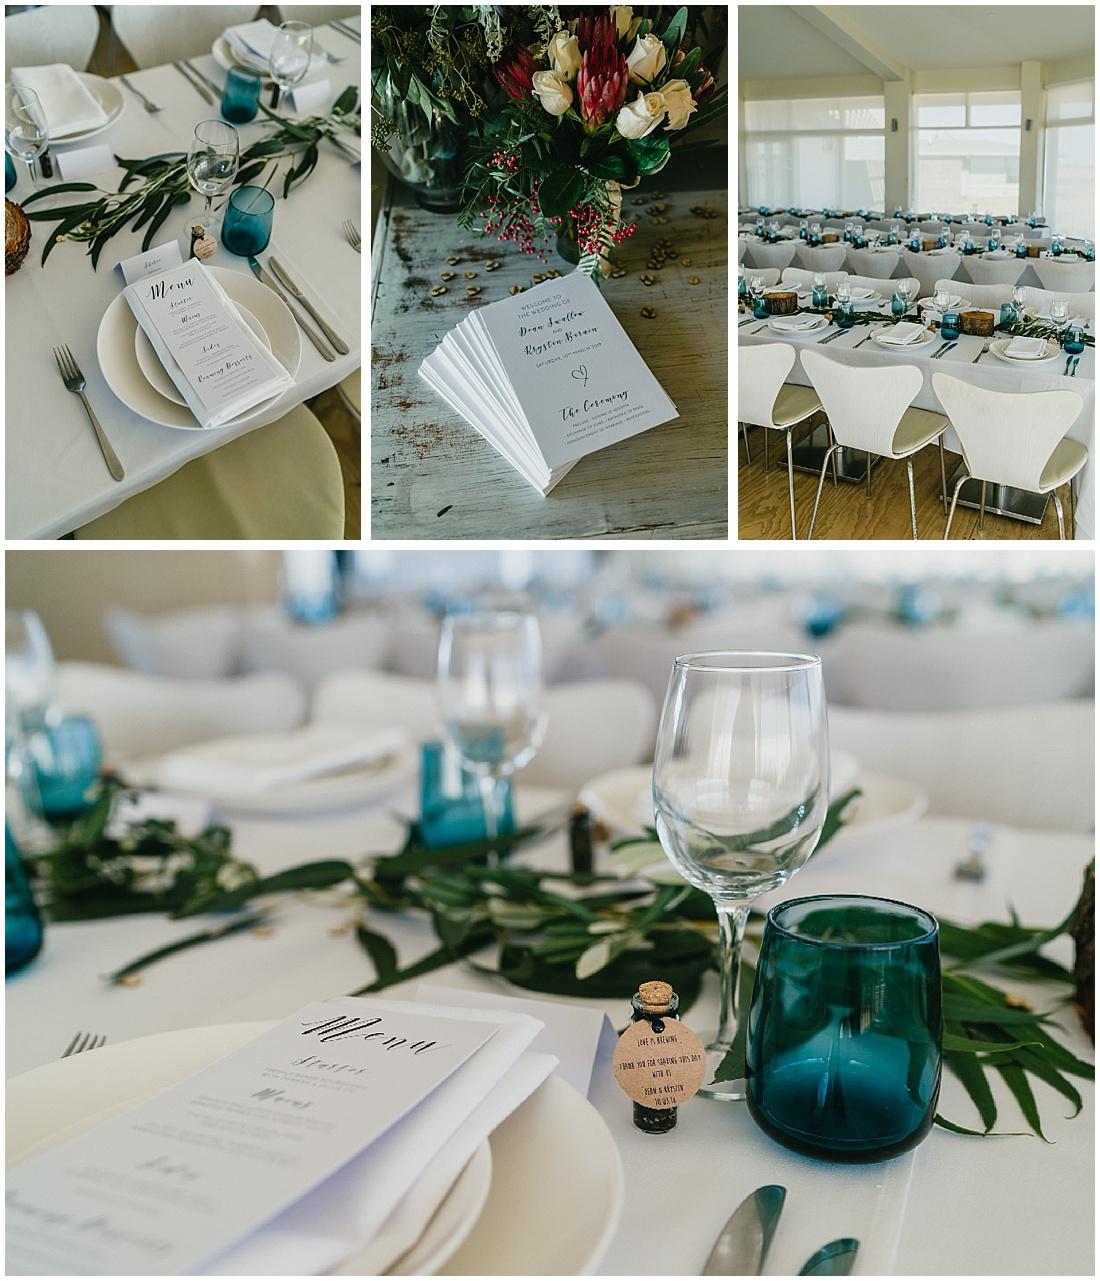 phillip island melbourne wedding photography_0018.jpg